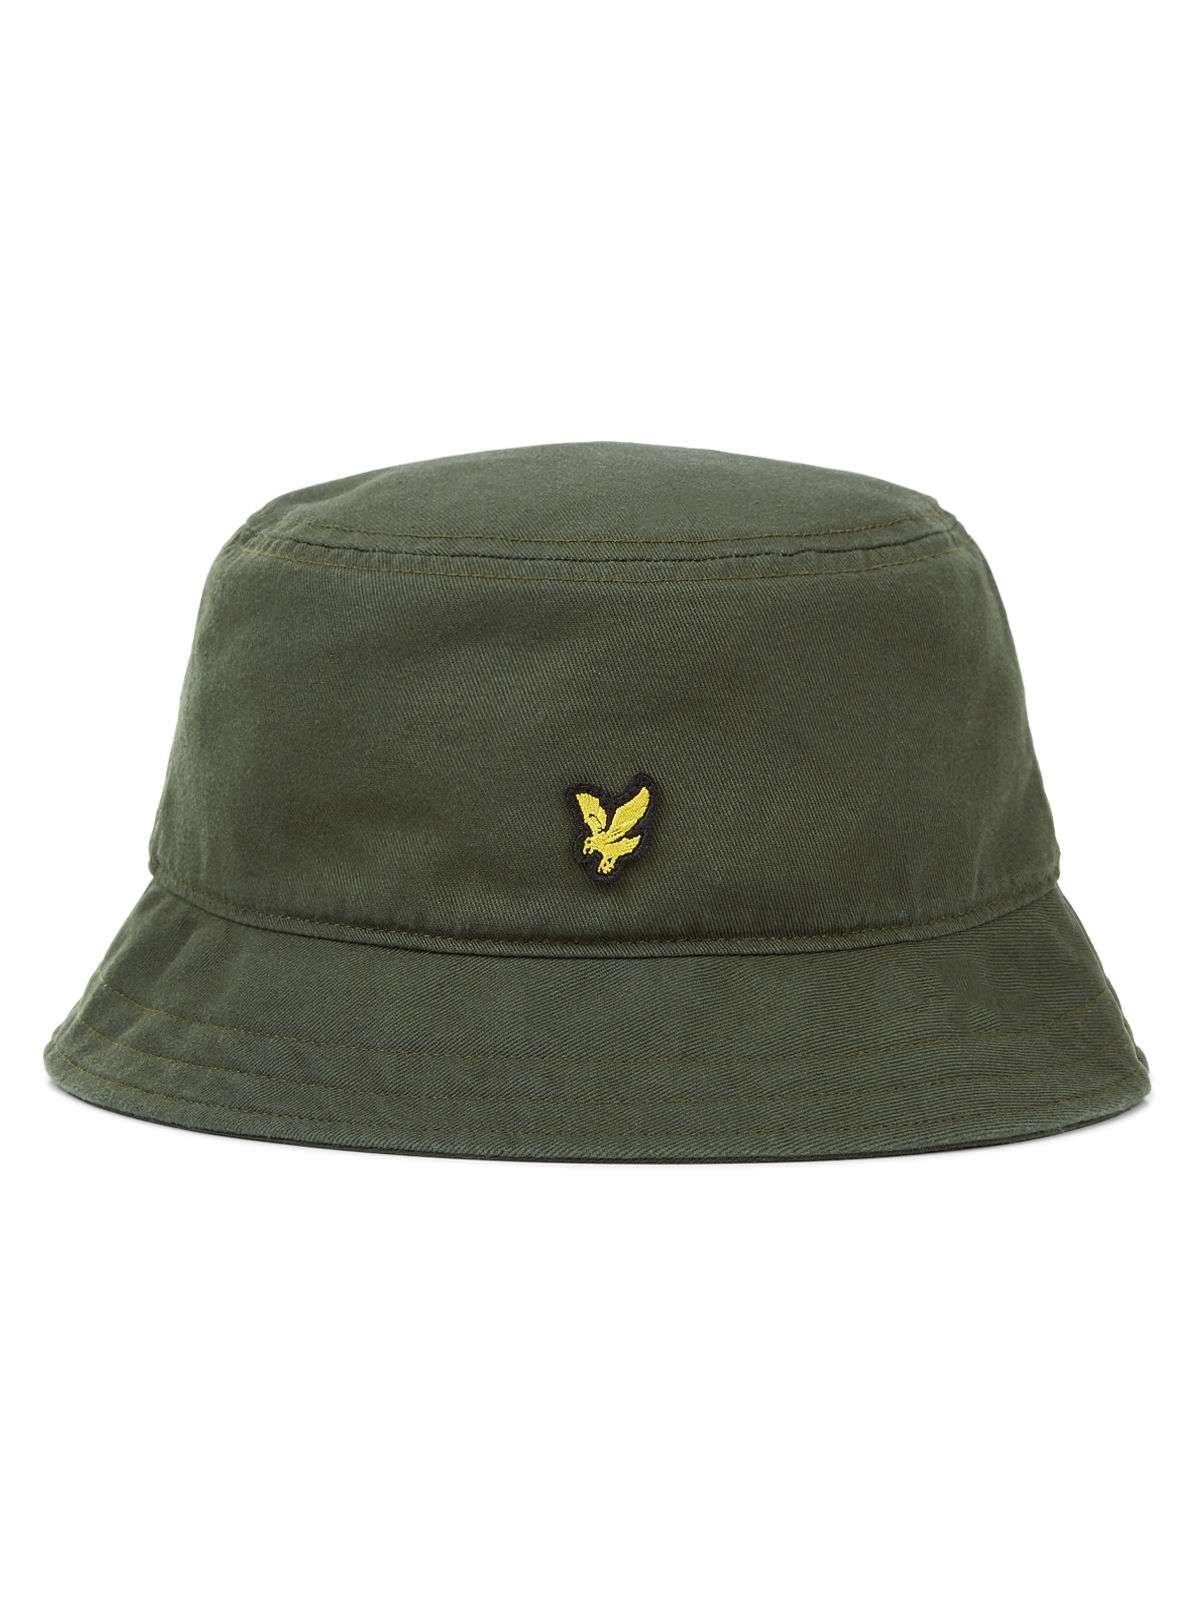 Details about Lyle   Scott Cotton Twill Bucket Hat Woodland Green 5a400599e03